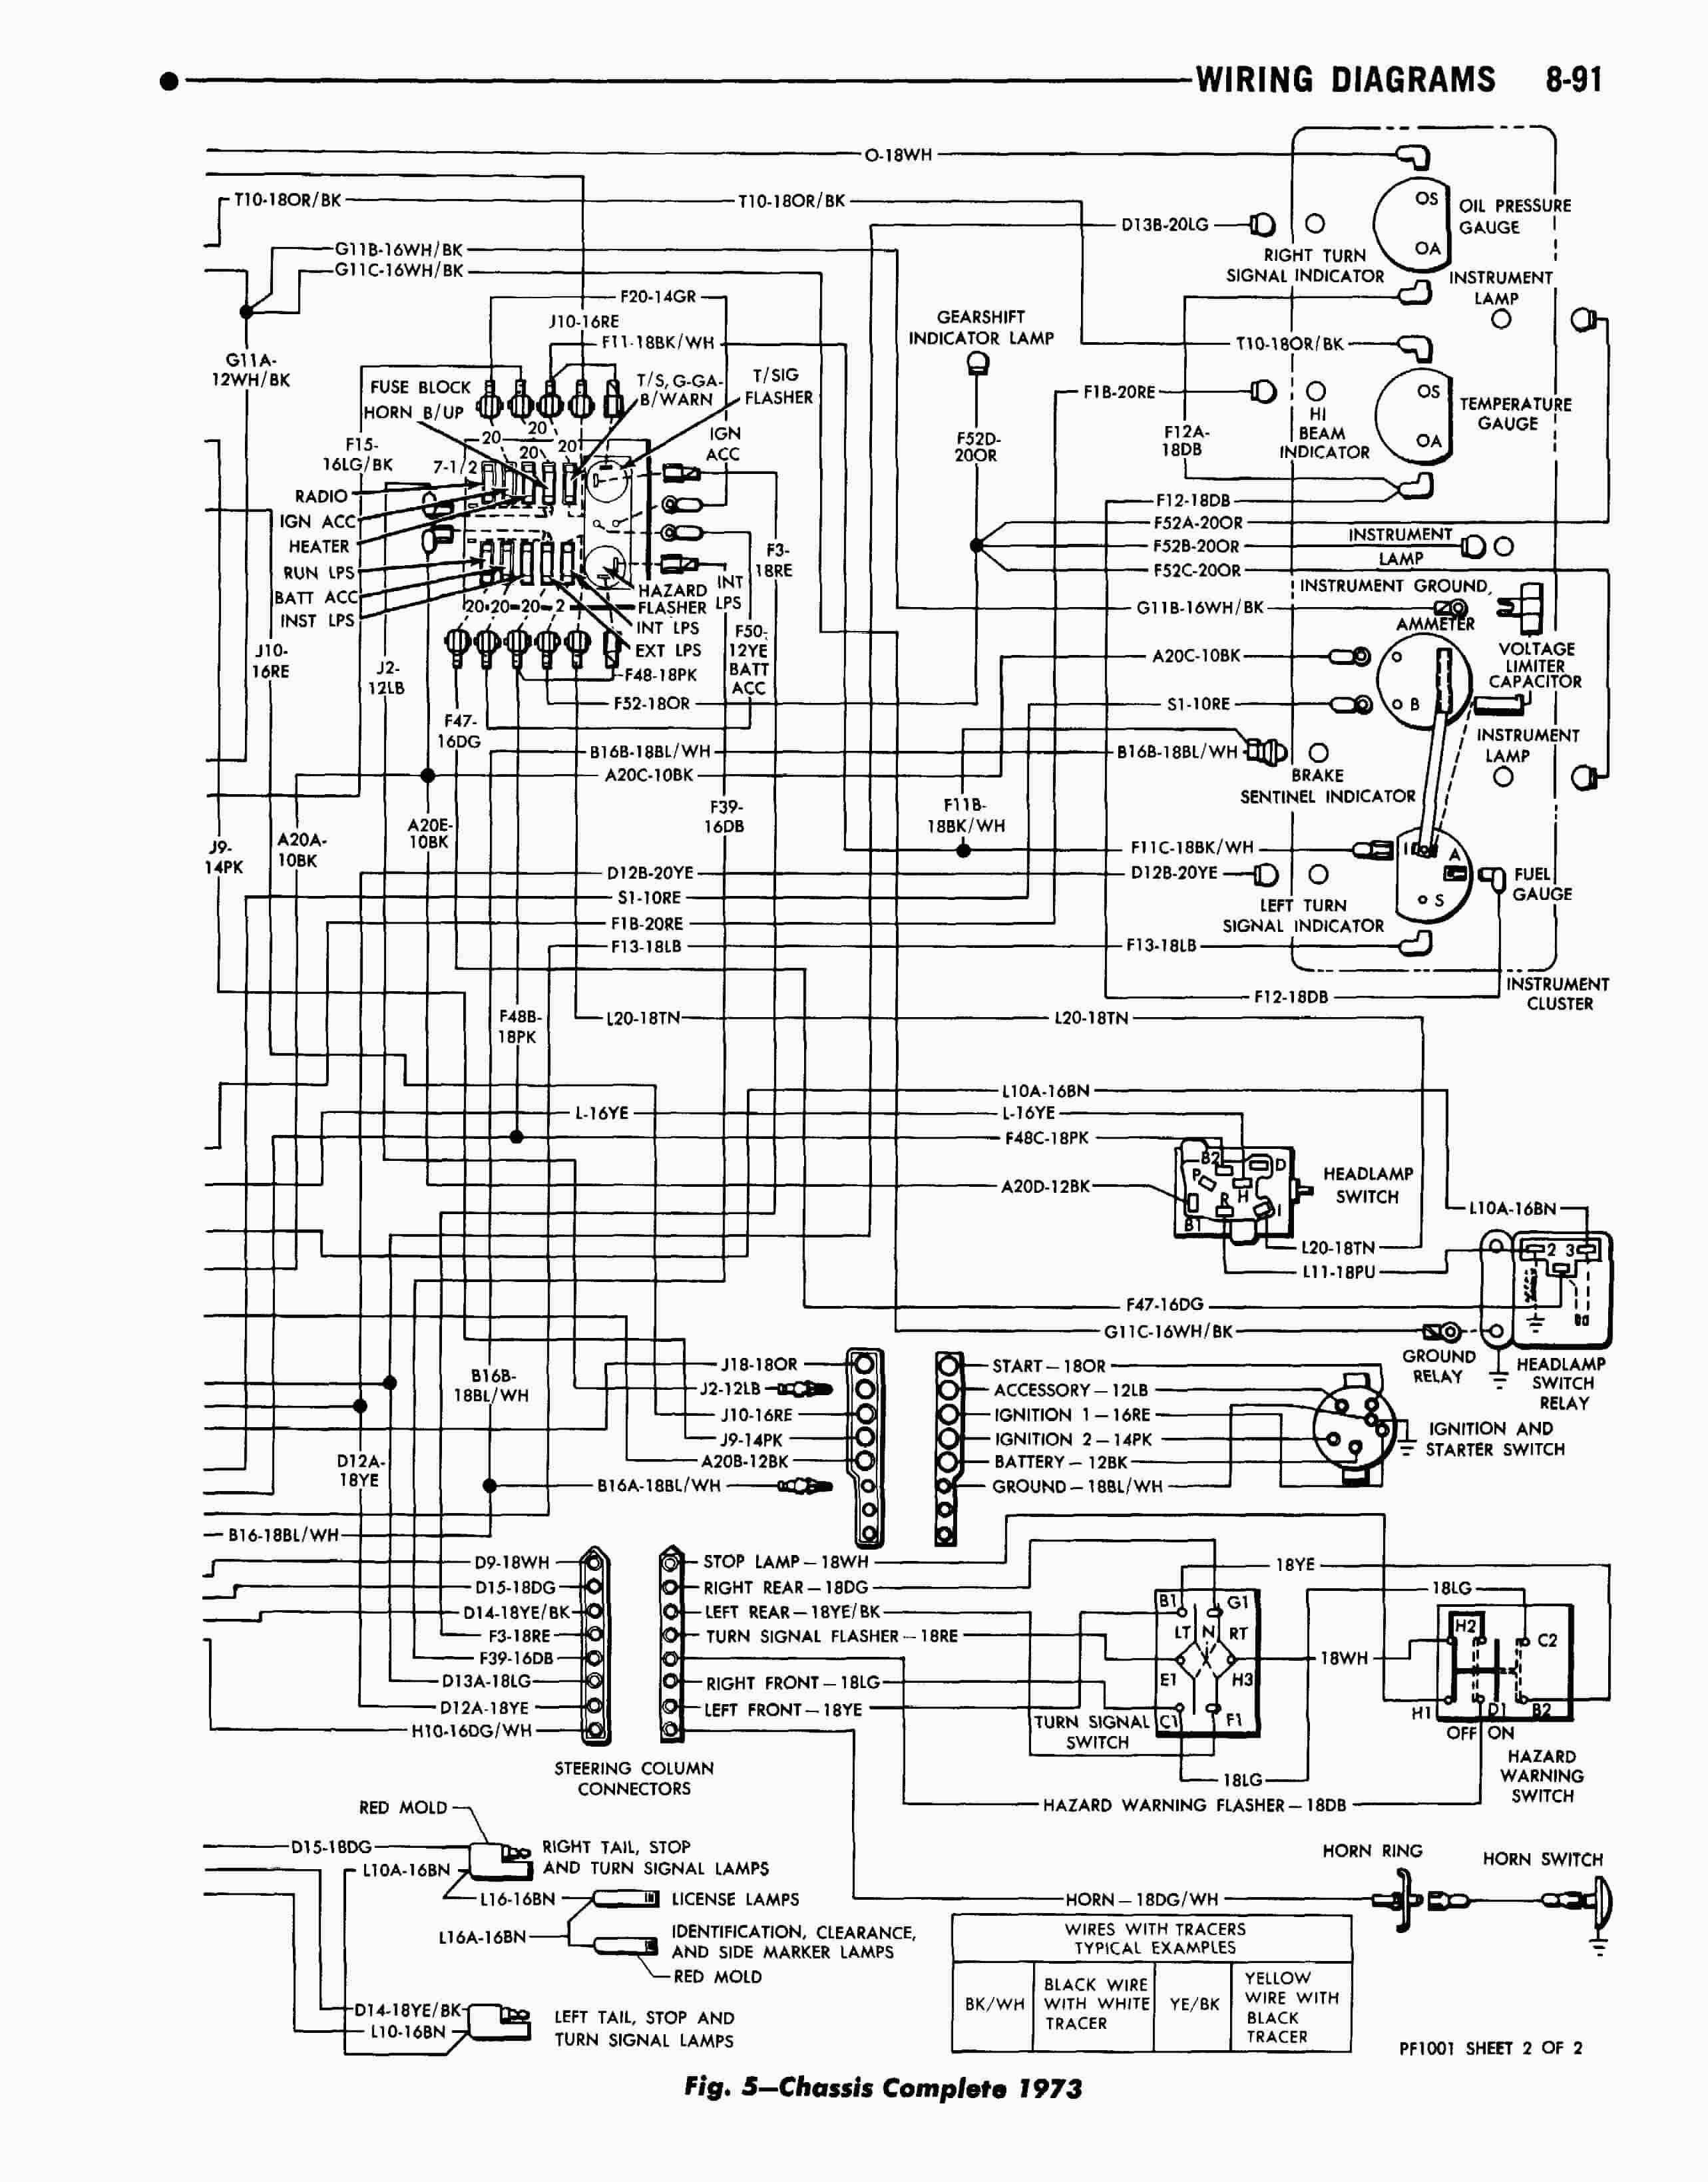 Ford F53 Wiring Diagram | meet-list Wiring Diagram Models -  meet-list.hoteldelmarlidodicamaiore.it | Ford F53 Chassis Wiring |  | Hotel del Mar a Lido di Camaiore